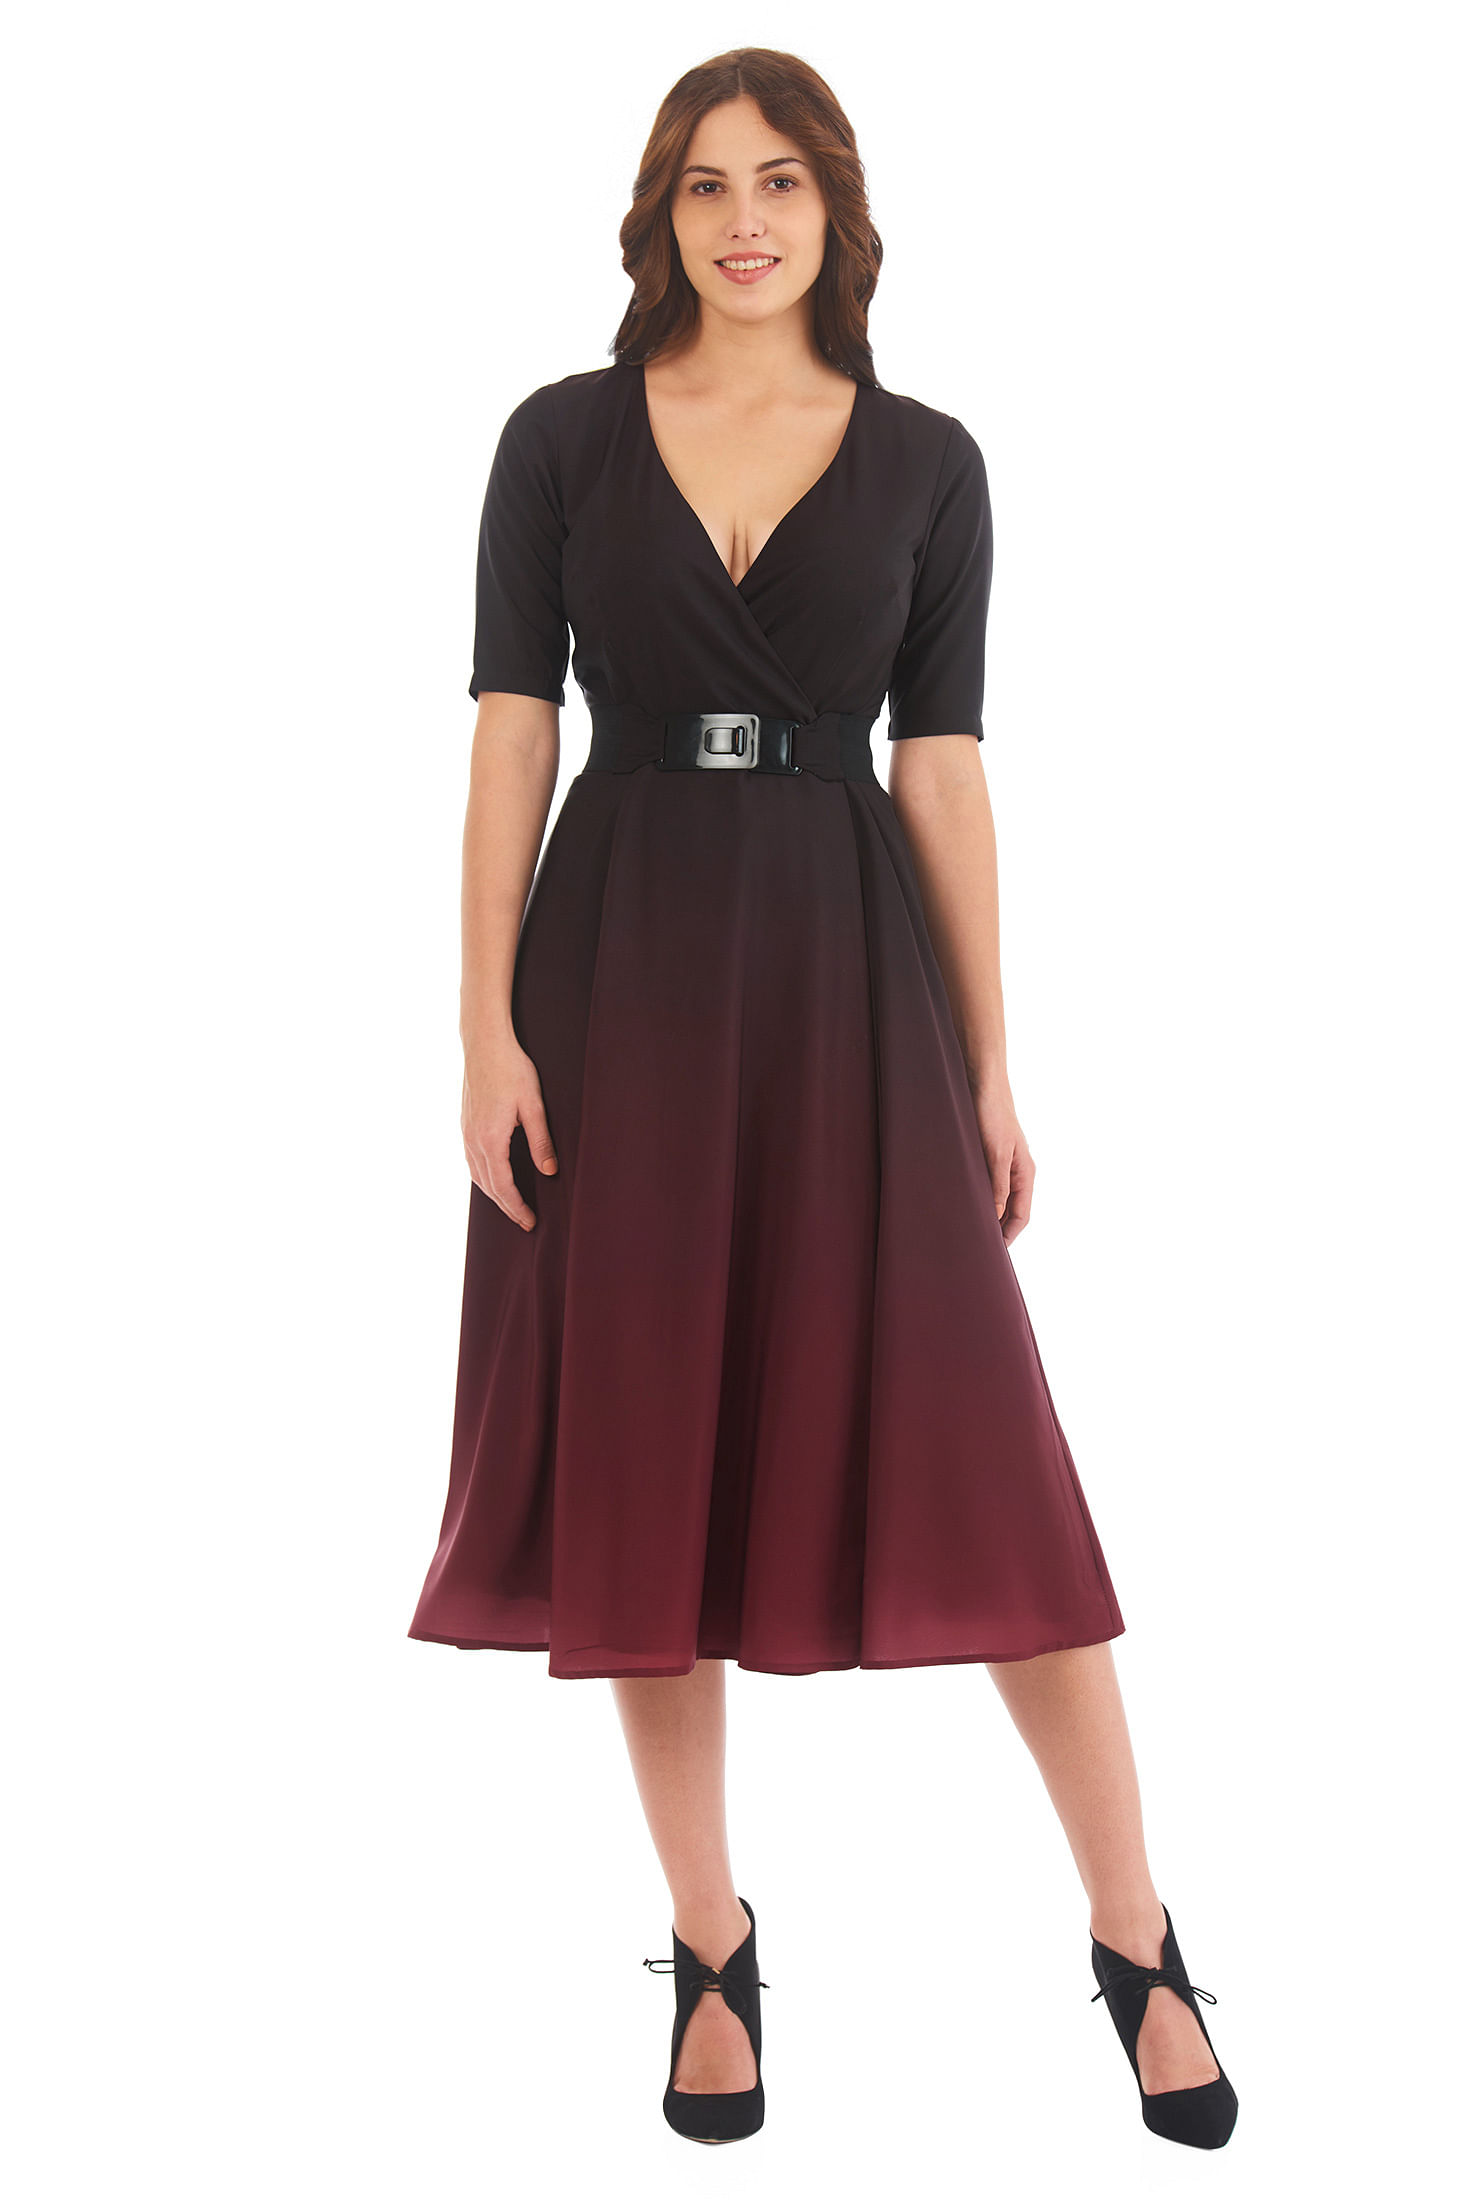 Women 39 s fashion clothing 0 36w and custom for Hawaii wedding guest dress